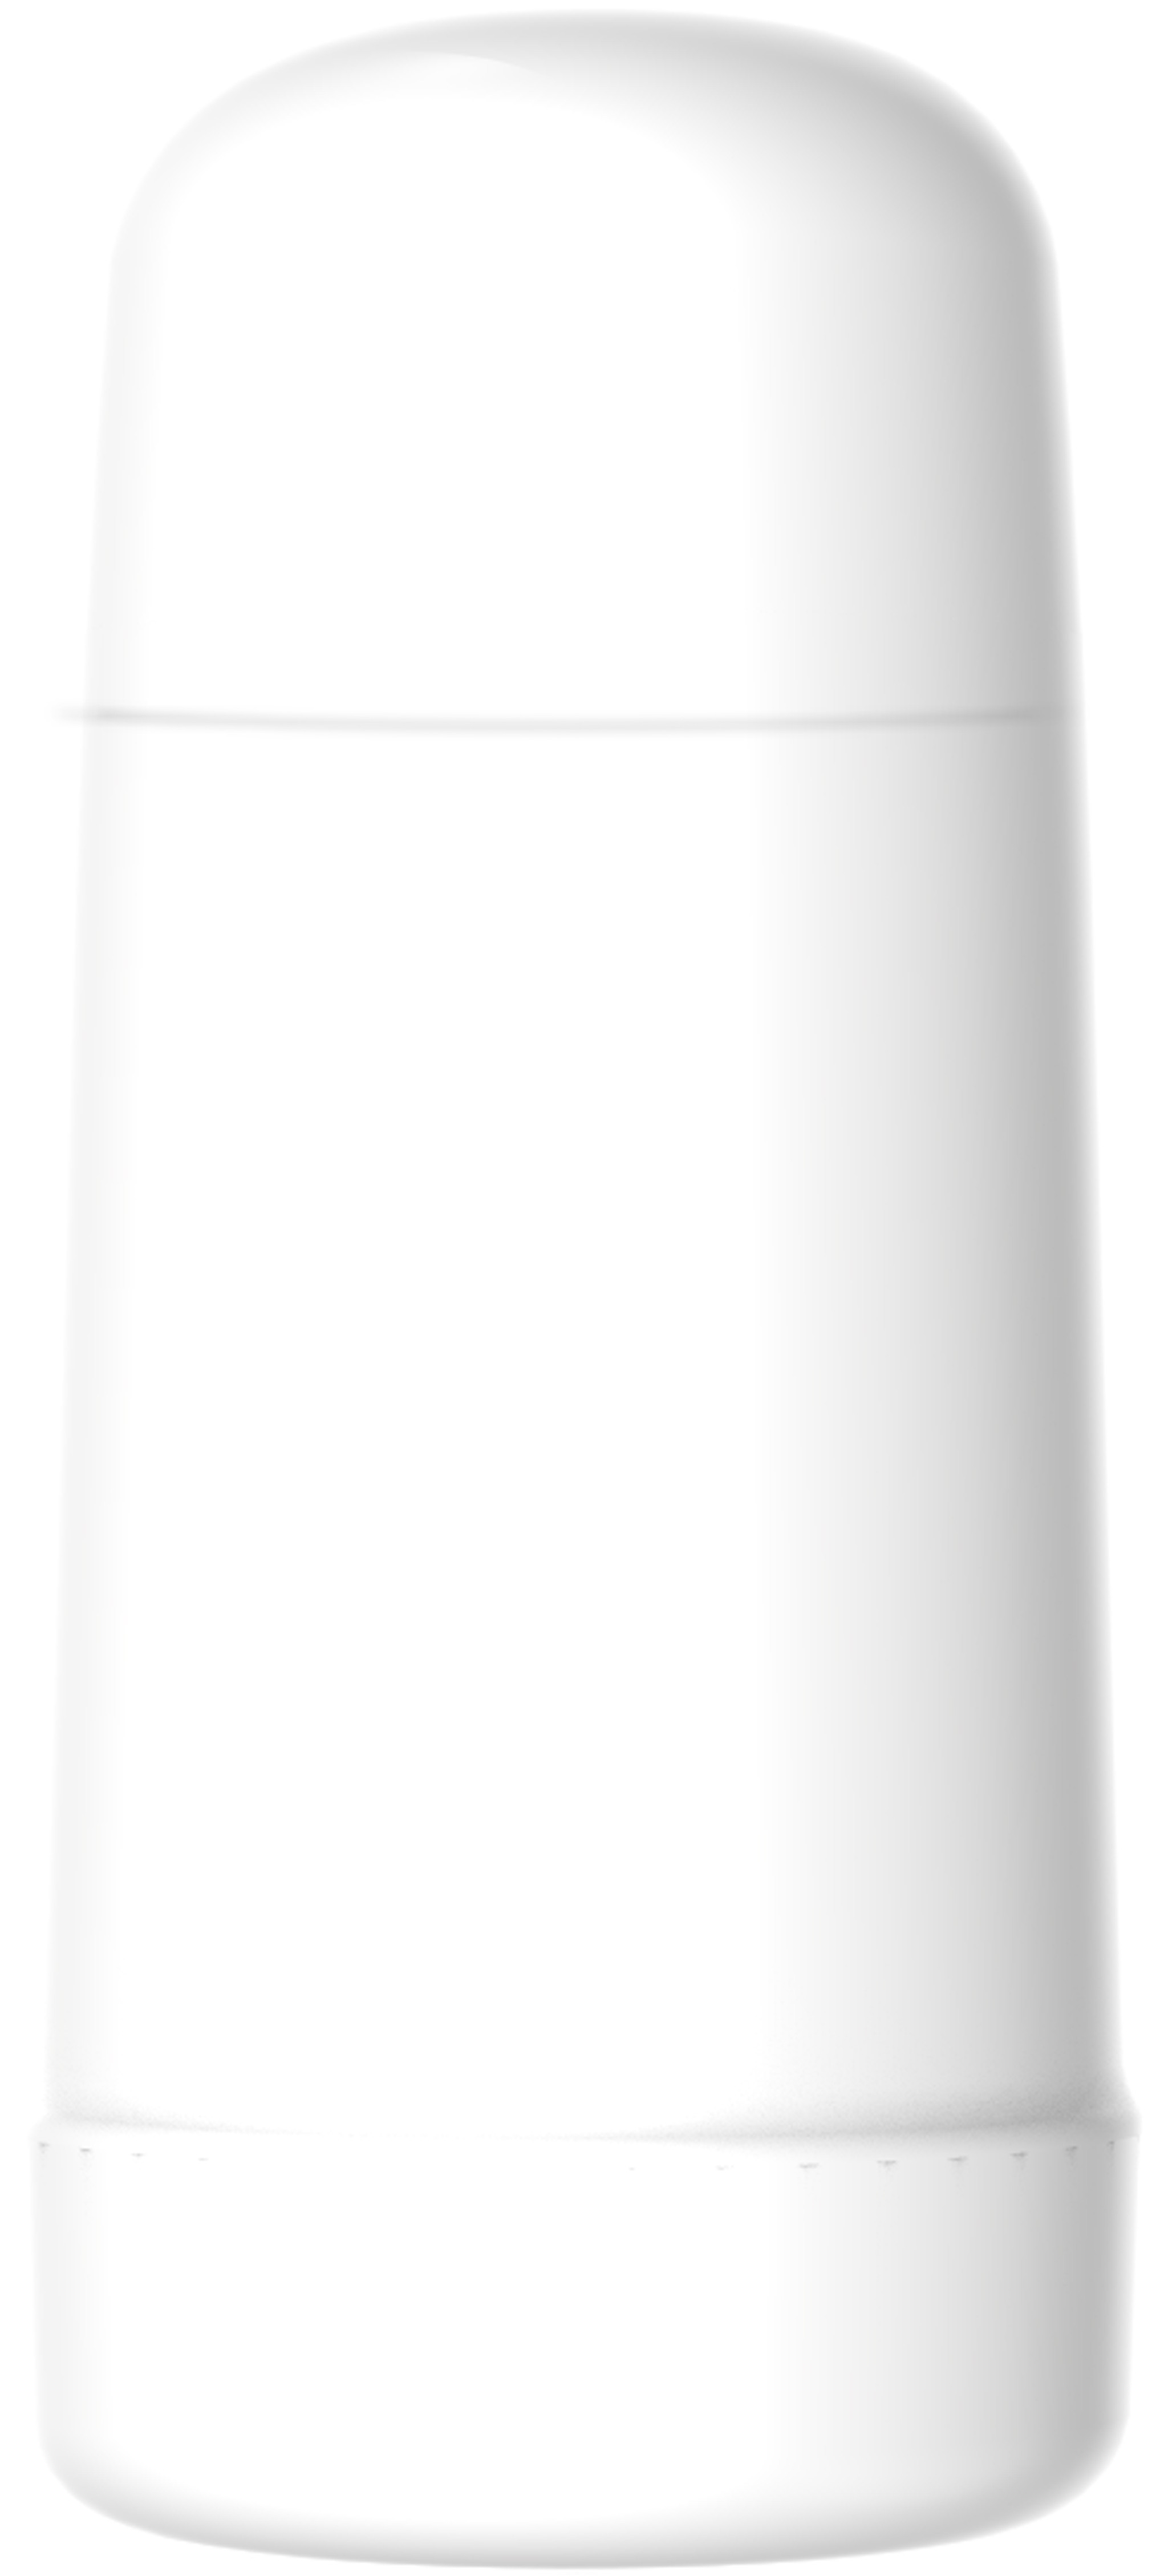 Garrafa Termica Minigarbo Branca 250ml Rolha Clean - Termolar